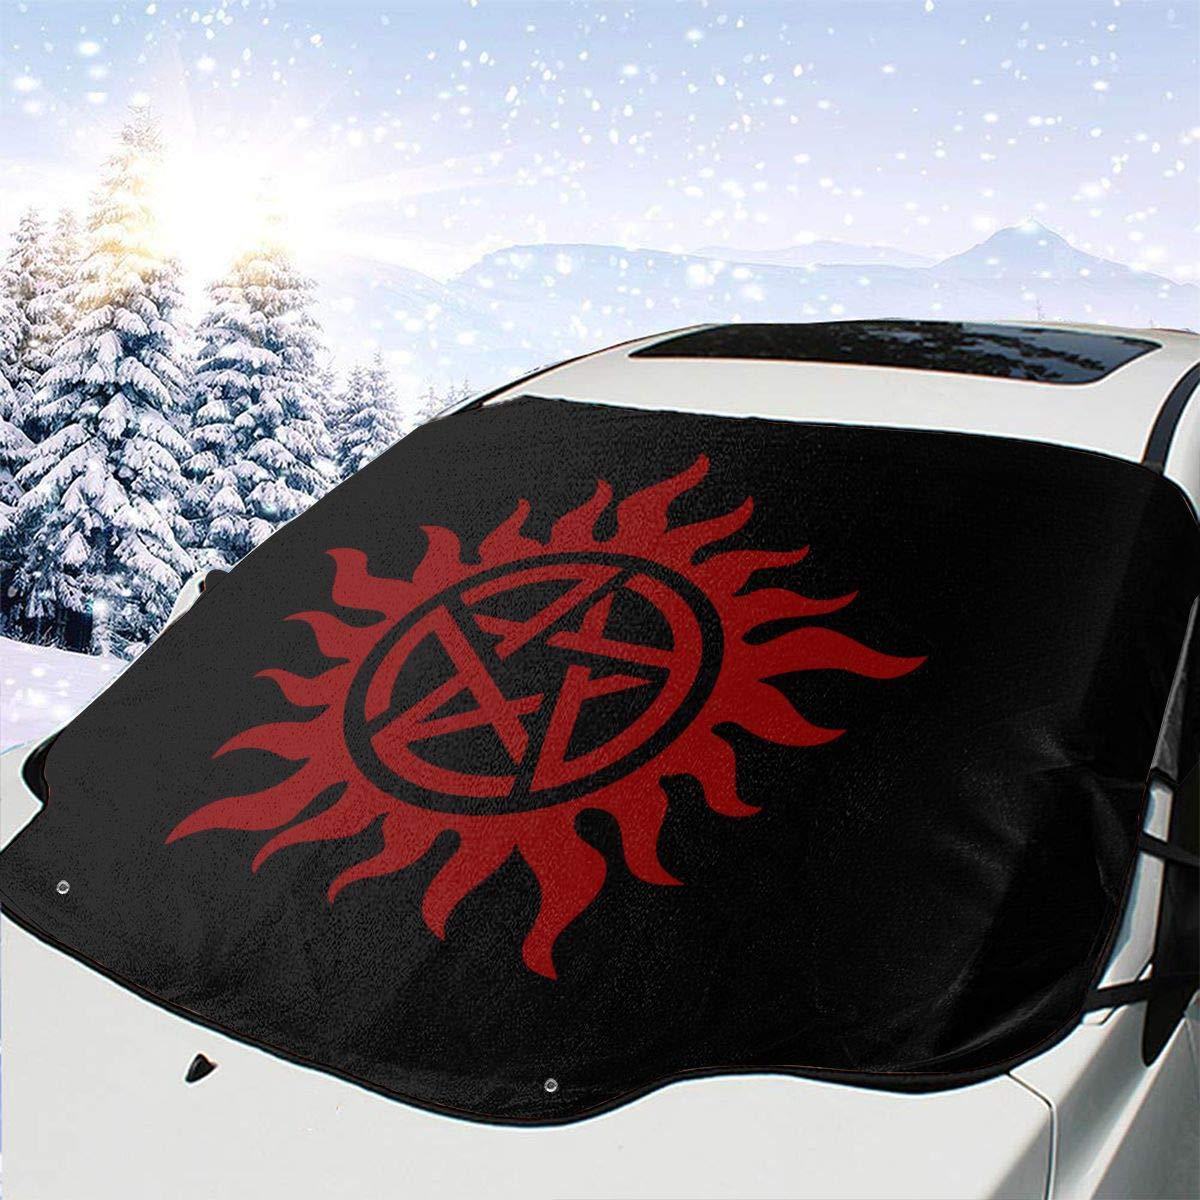 New Unique Custom Supernatural UV Rays Protection Windshield Visor Car Sun Shade